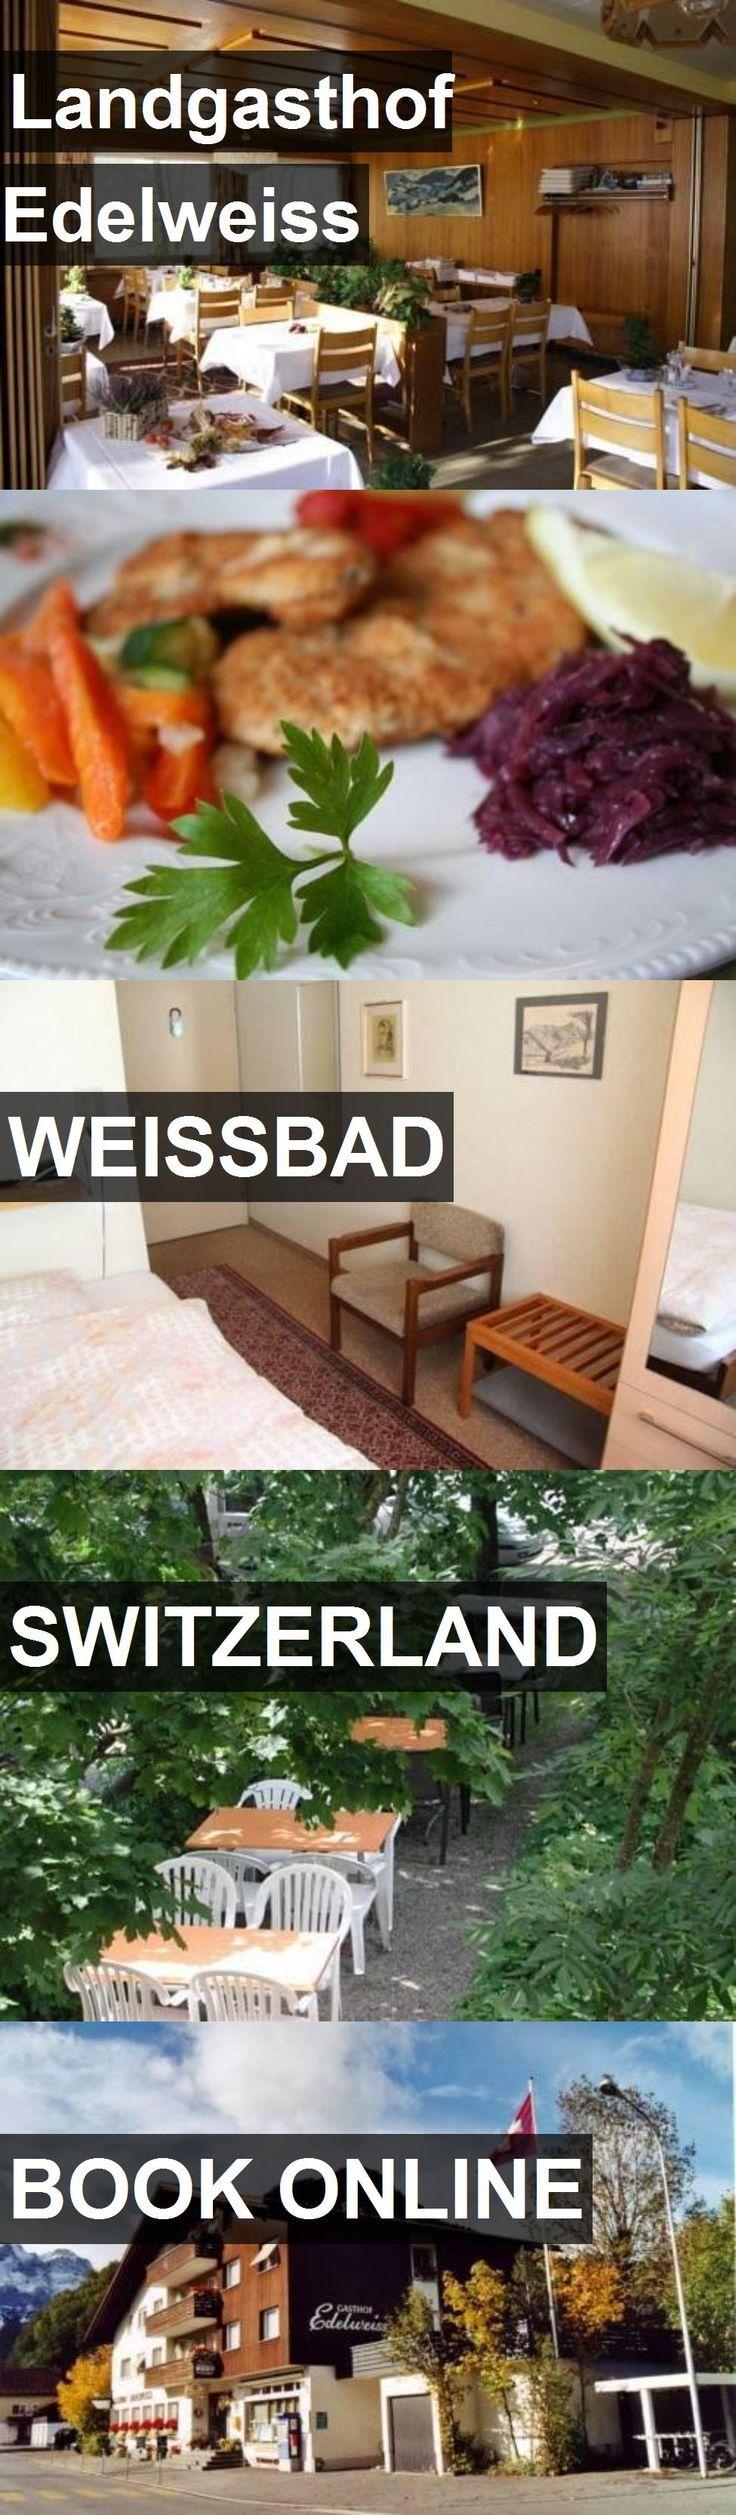 Hotel Landgasthof Edelweiss in Weissbad, Switzerland. For more information, photos, reviews and best prices please follow the link. #Switzerland #Weissbad #travel #vacation #hotel